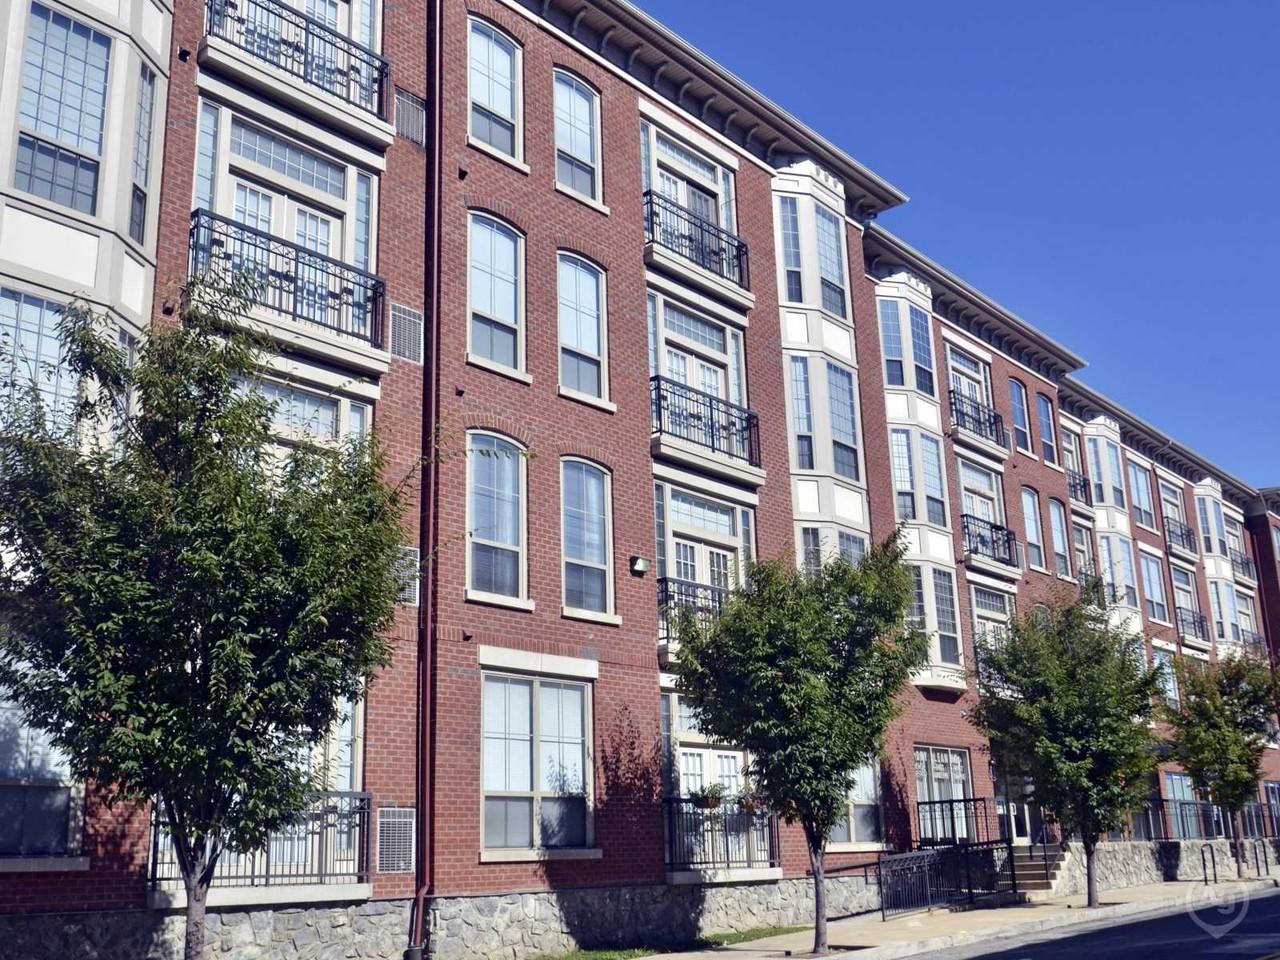 dobson mills apartments lofts 4055 ridge ave philadelphia pa